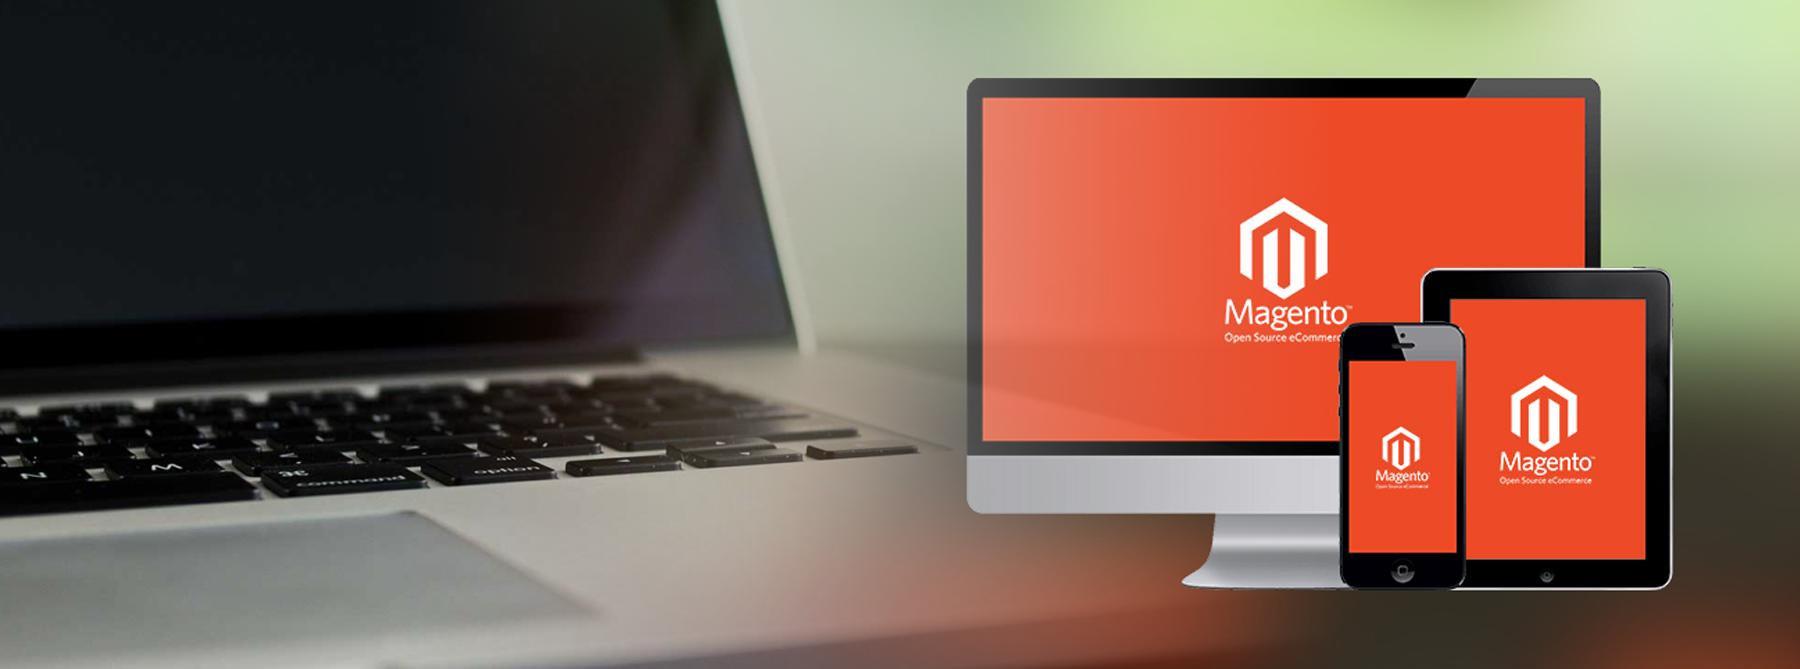 Top Magento Web Development Companies & Developers 2019